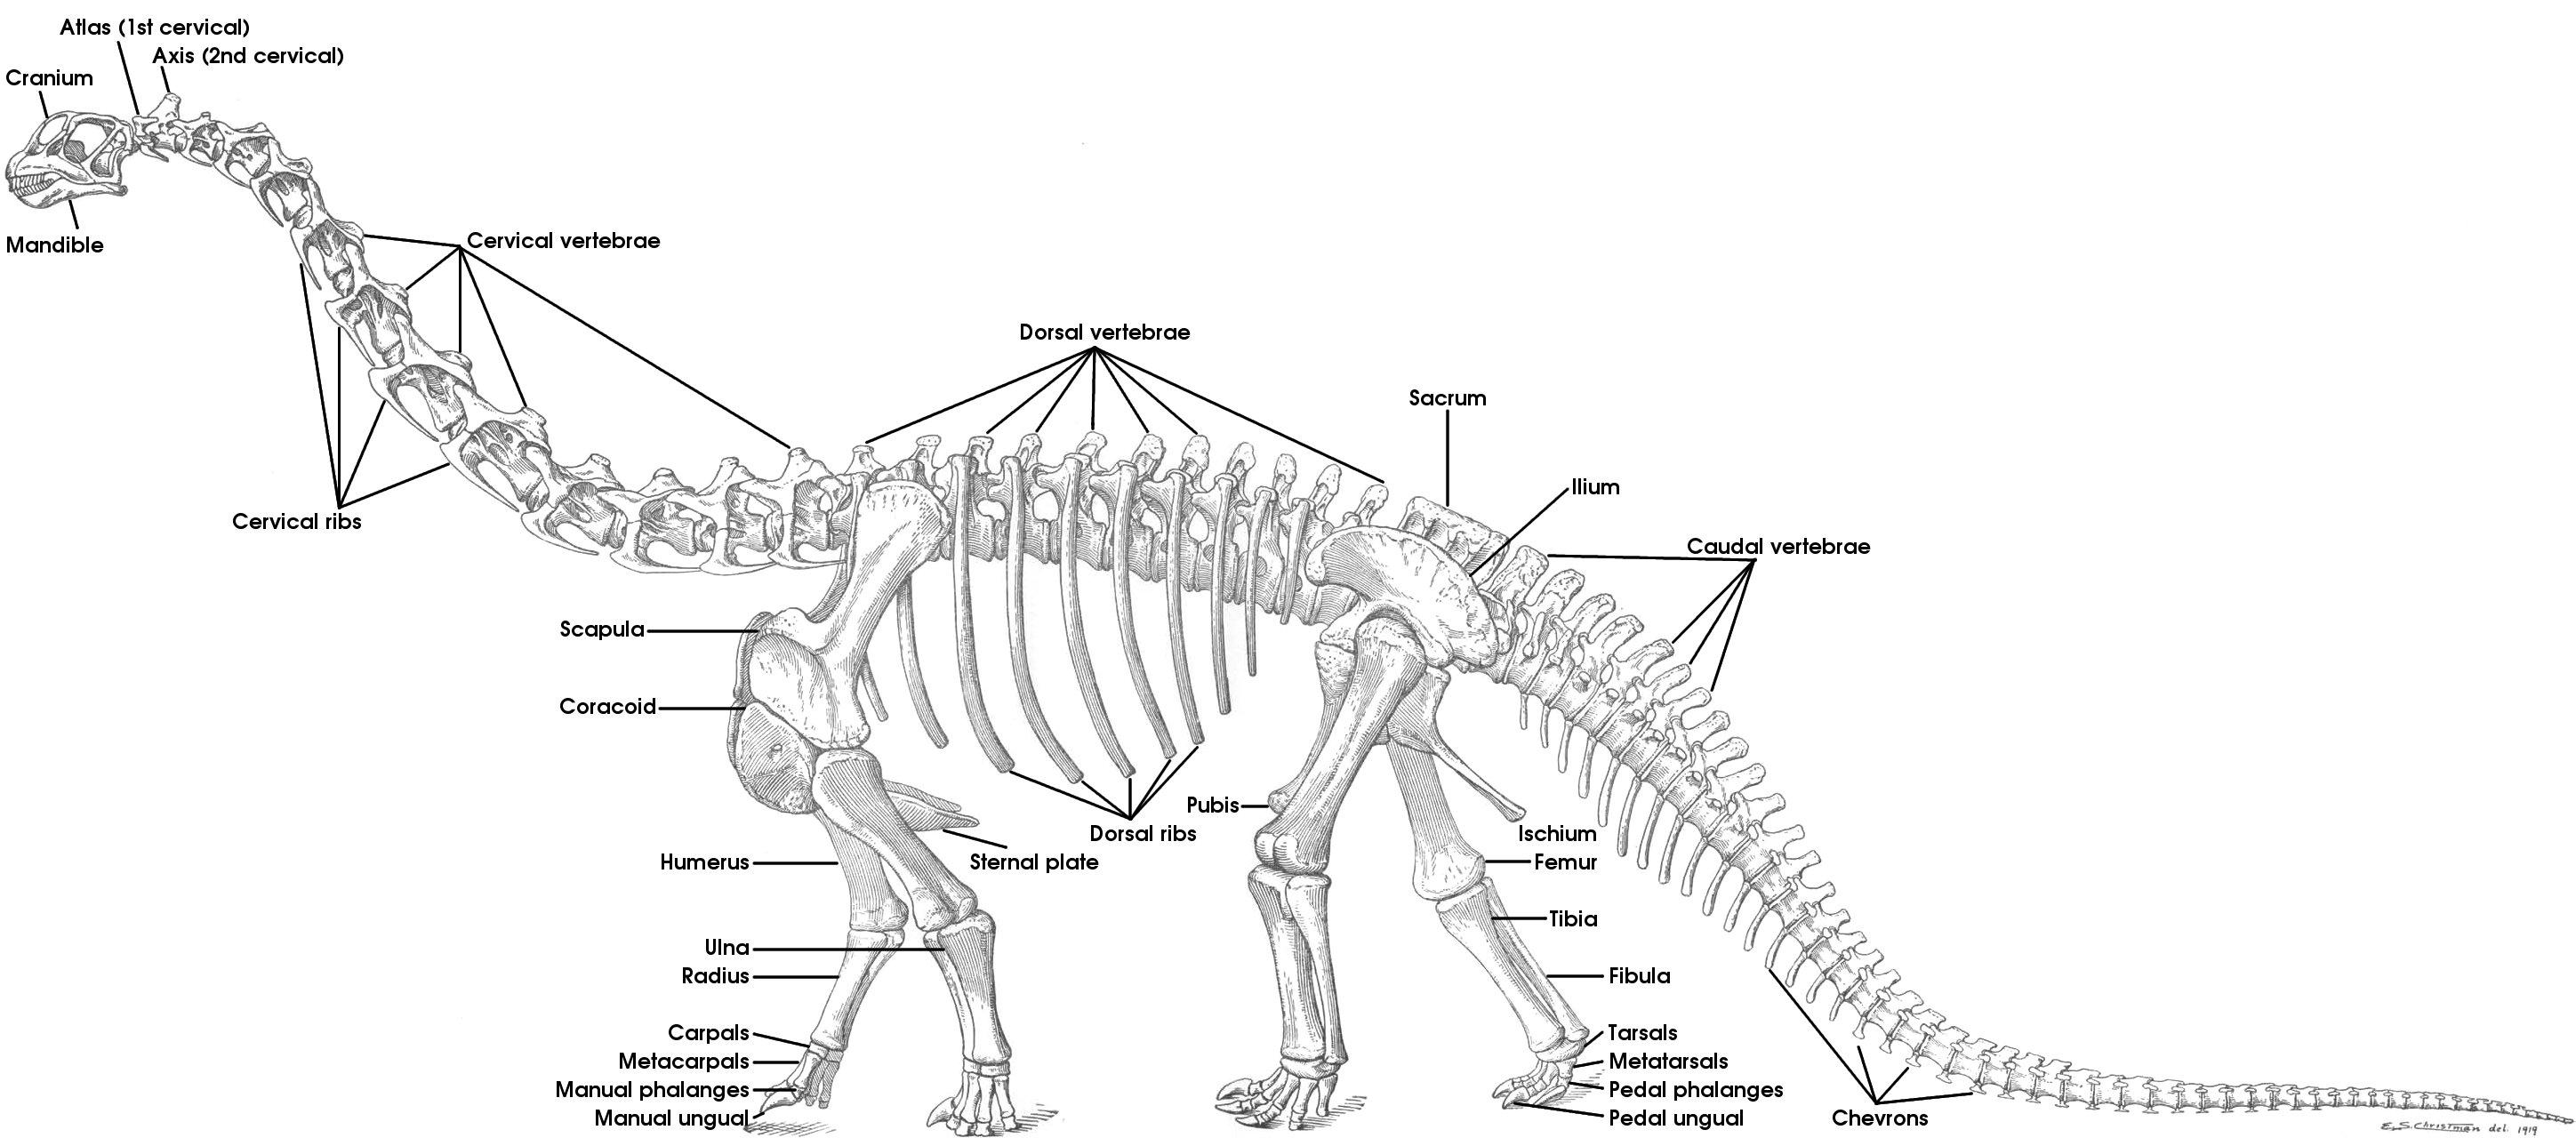 bones skeleton diagram with labels 240v to 12v transformer wiring tutorial 15 the of sauropod